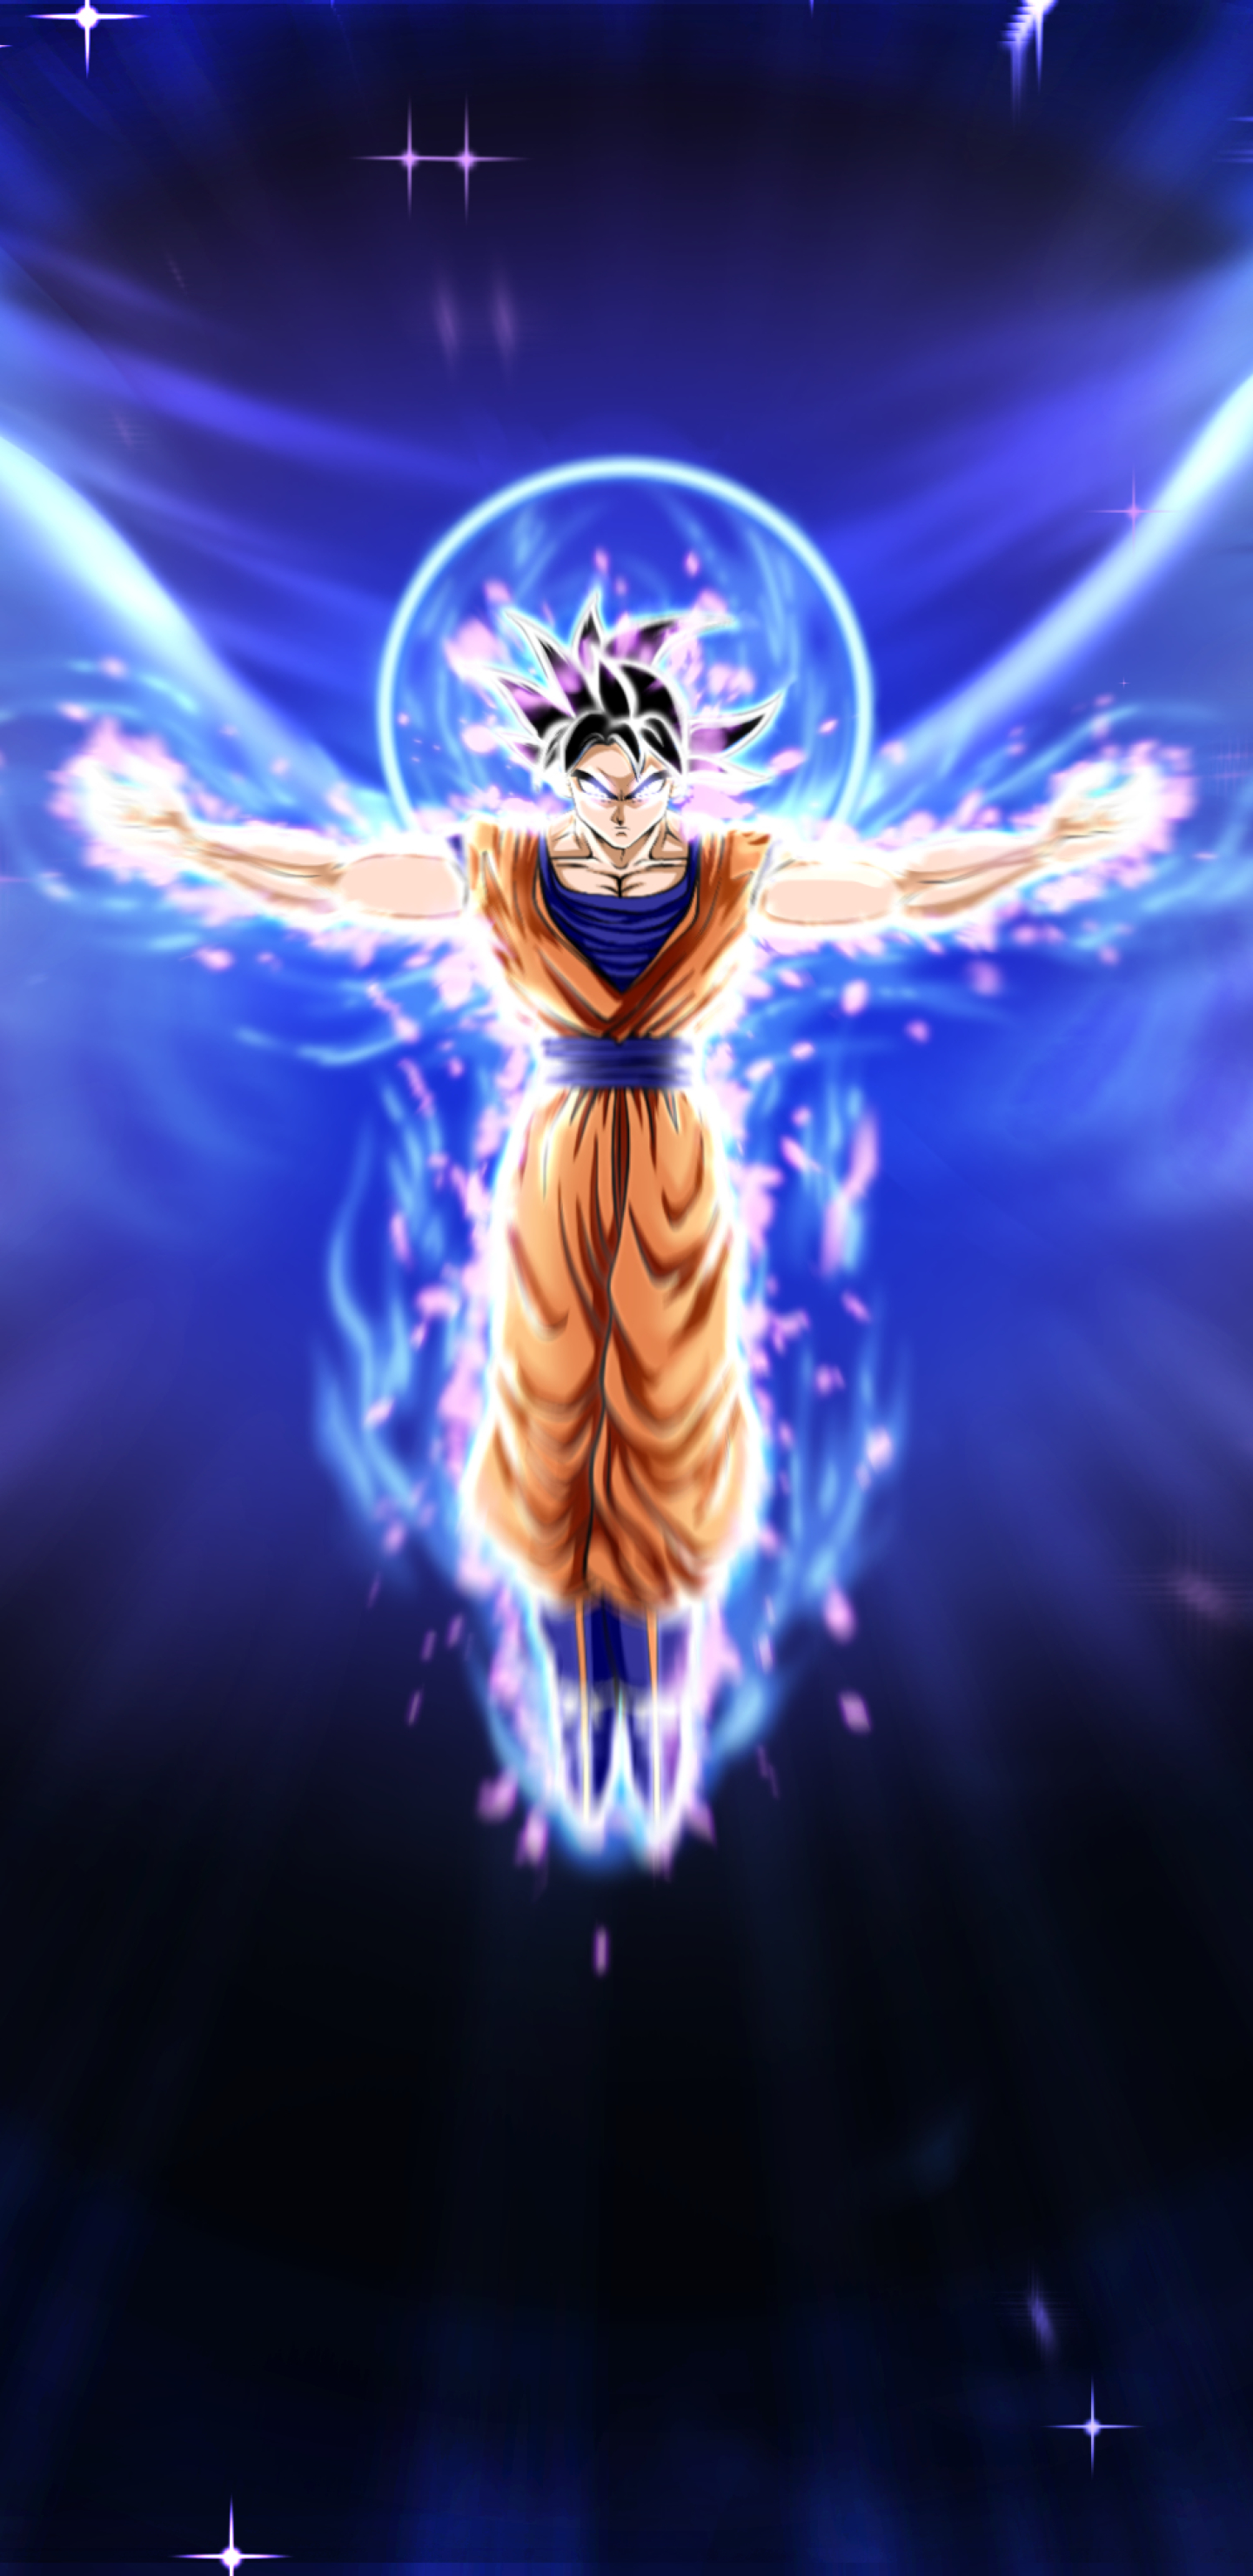 1440x2960 Ultra Instinct Dragon Ball Goku Samsung Galaxy Note 9 8